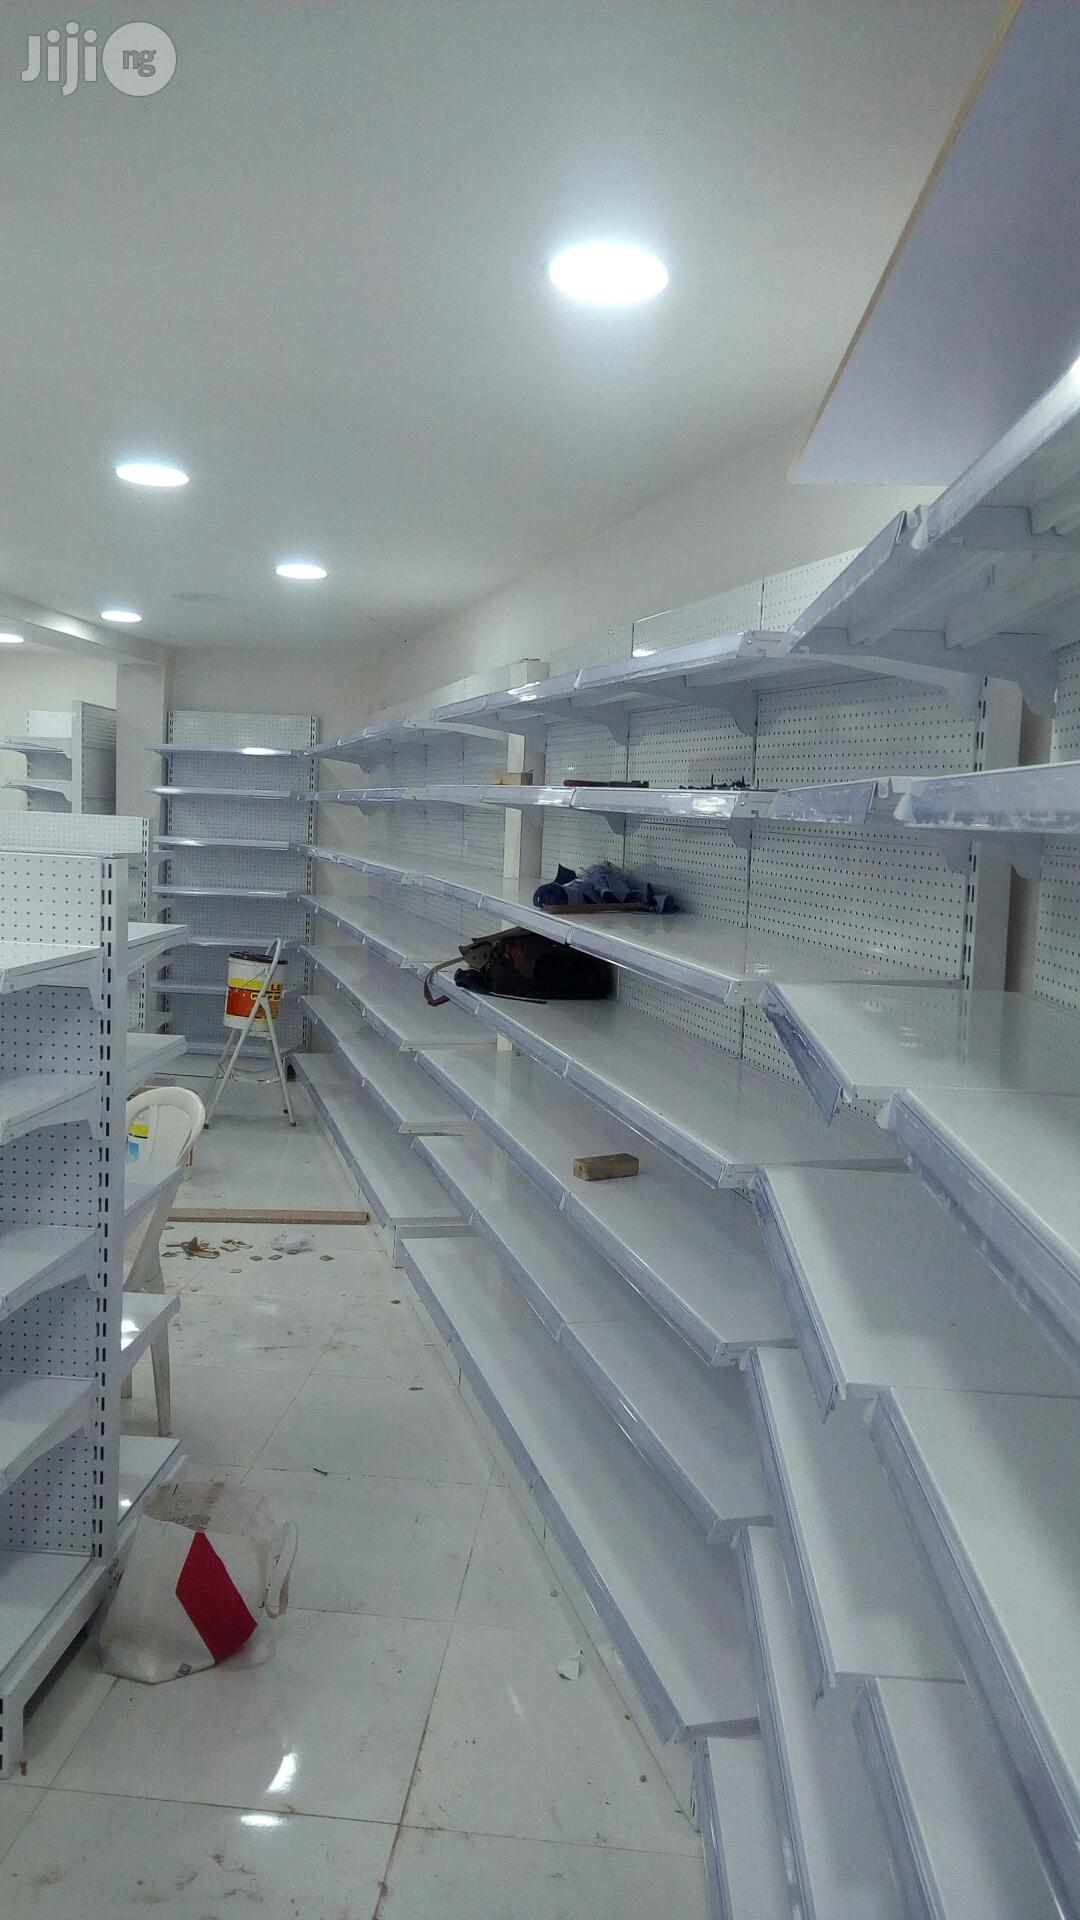 Supermarket Shelves At Affordable Prices 1